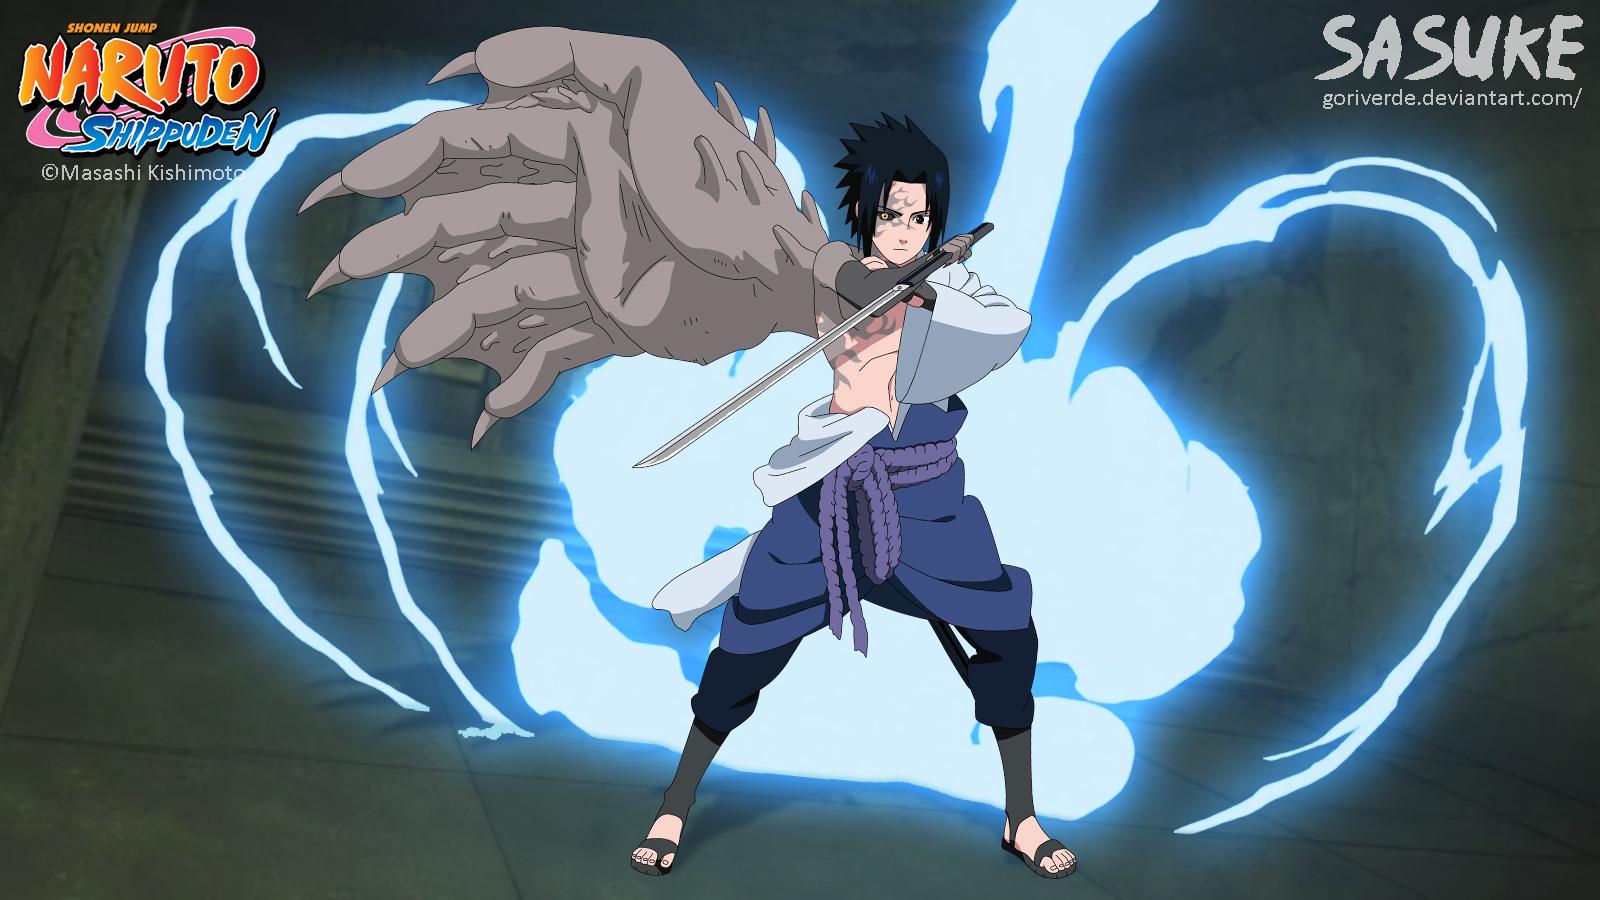 Sasuke (curse mark) by goriverde